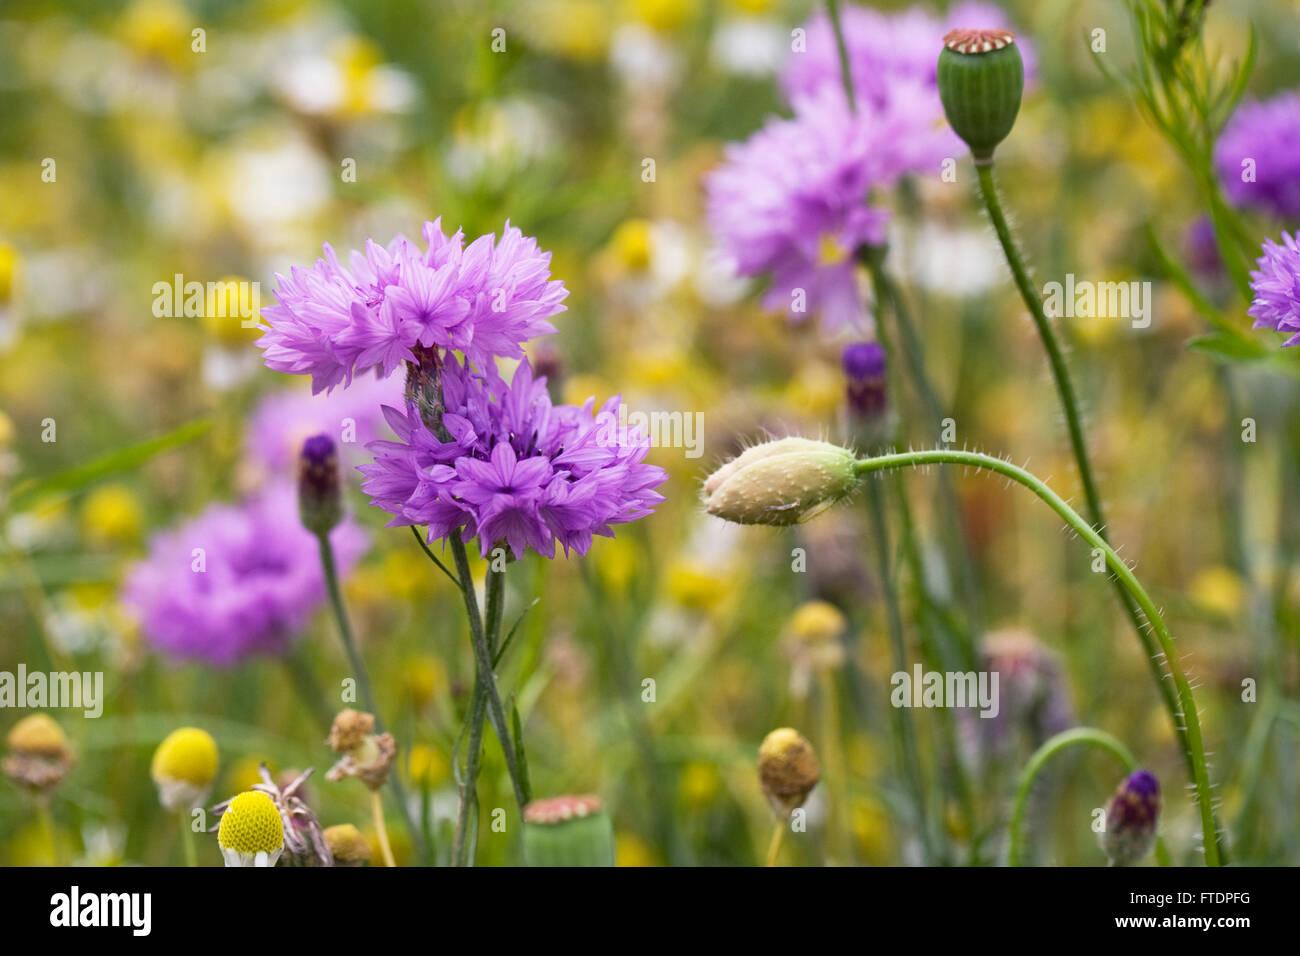 Centaurea cyanus. Cornflowers in a wildflower garden. Stock Photo